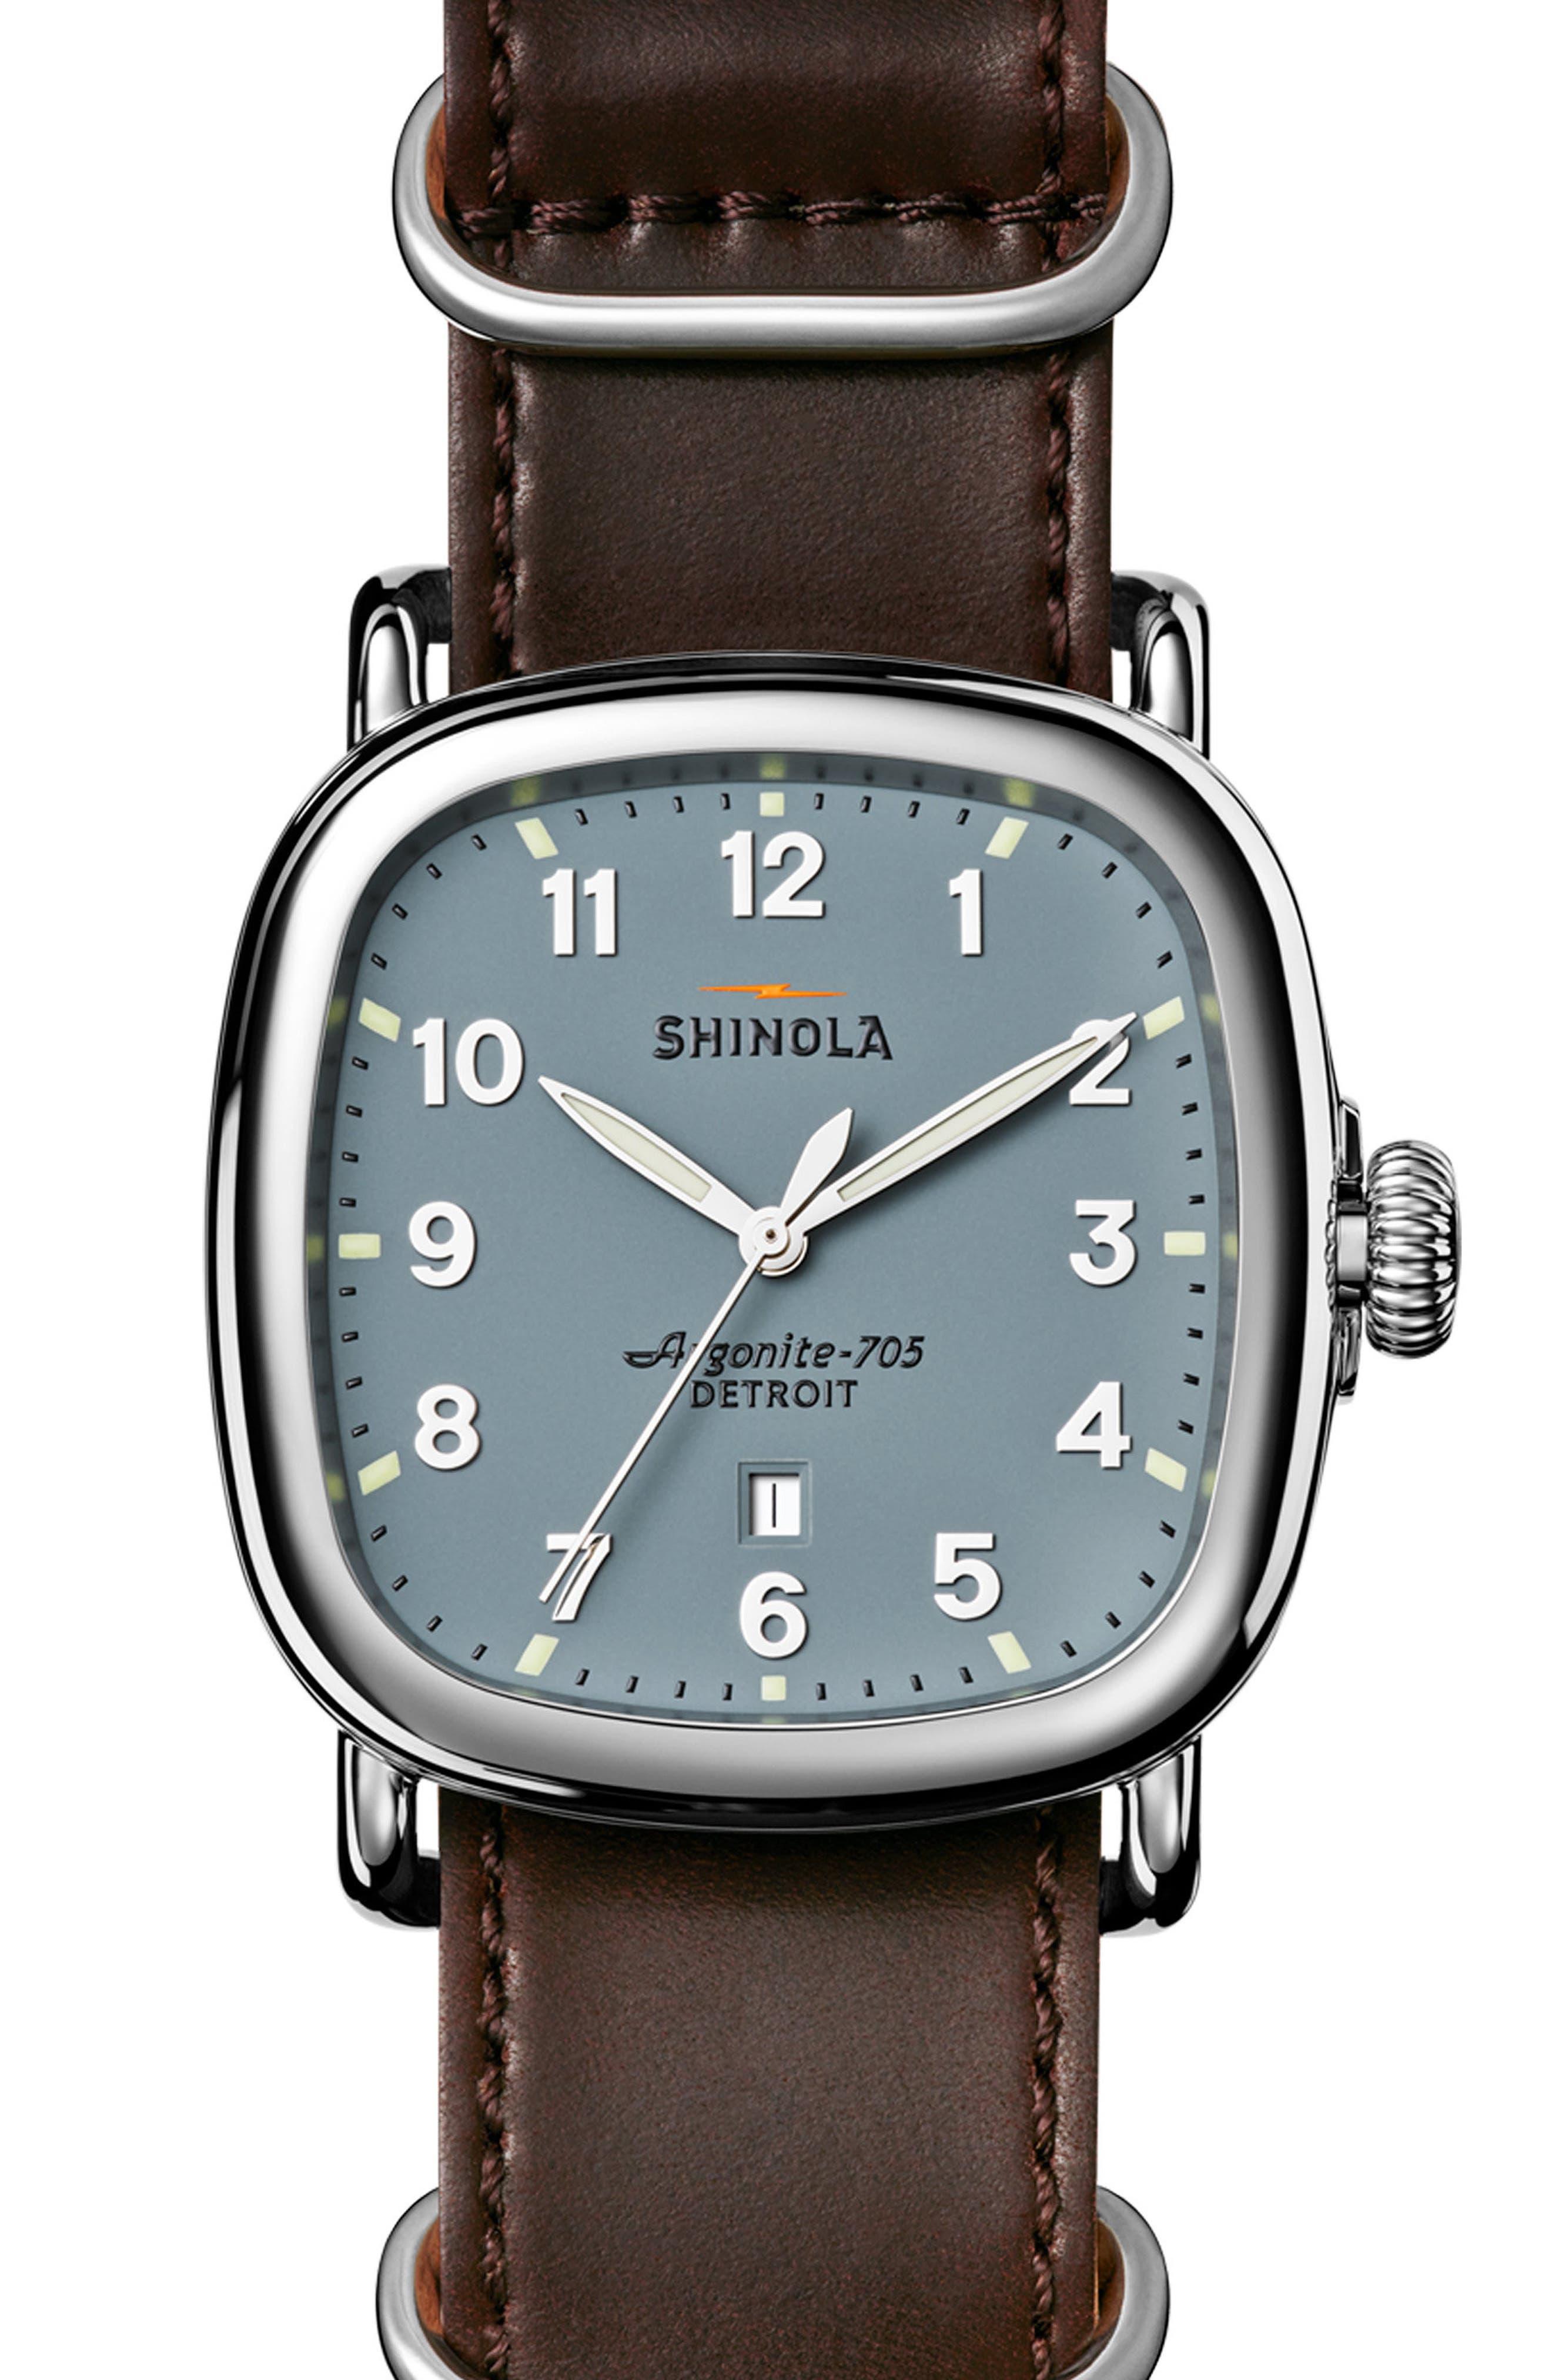 Main Image - Shinola The Guardian Leather Strap Watch, 41.5mm x 43mm